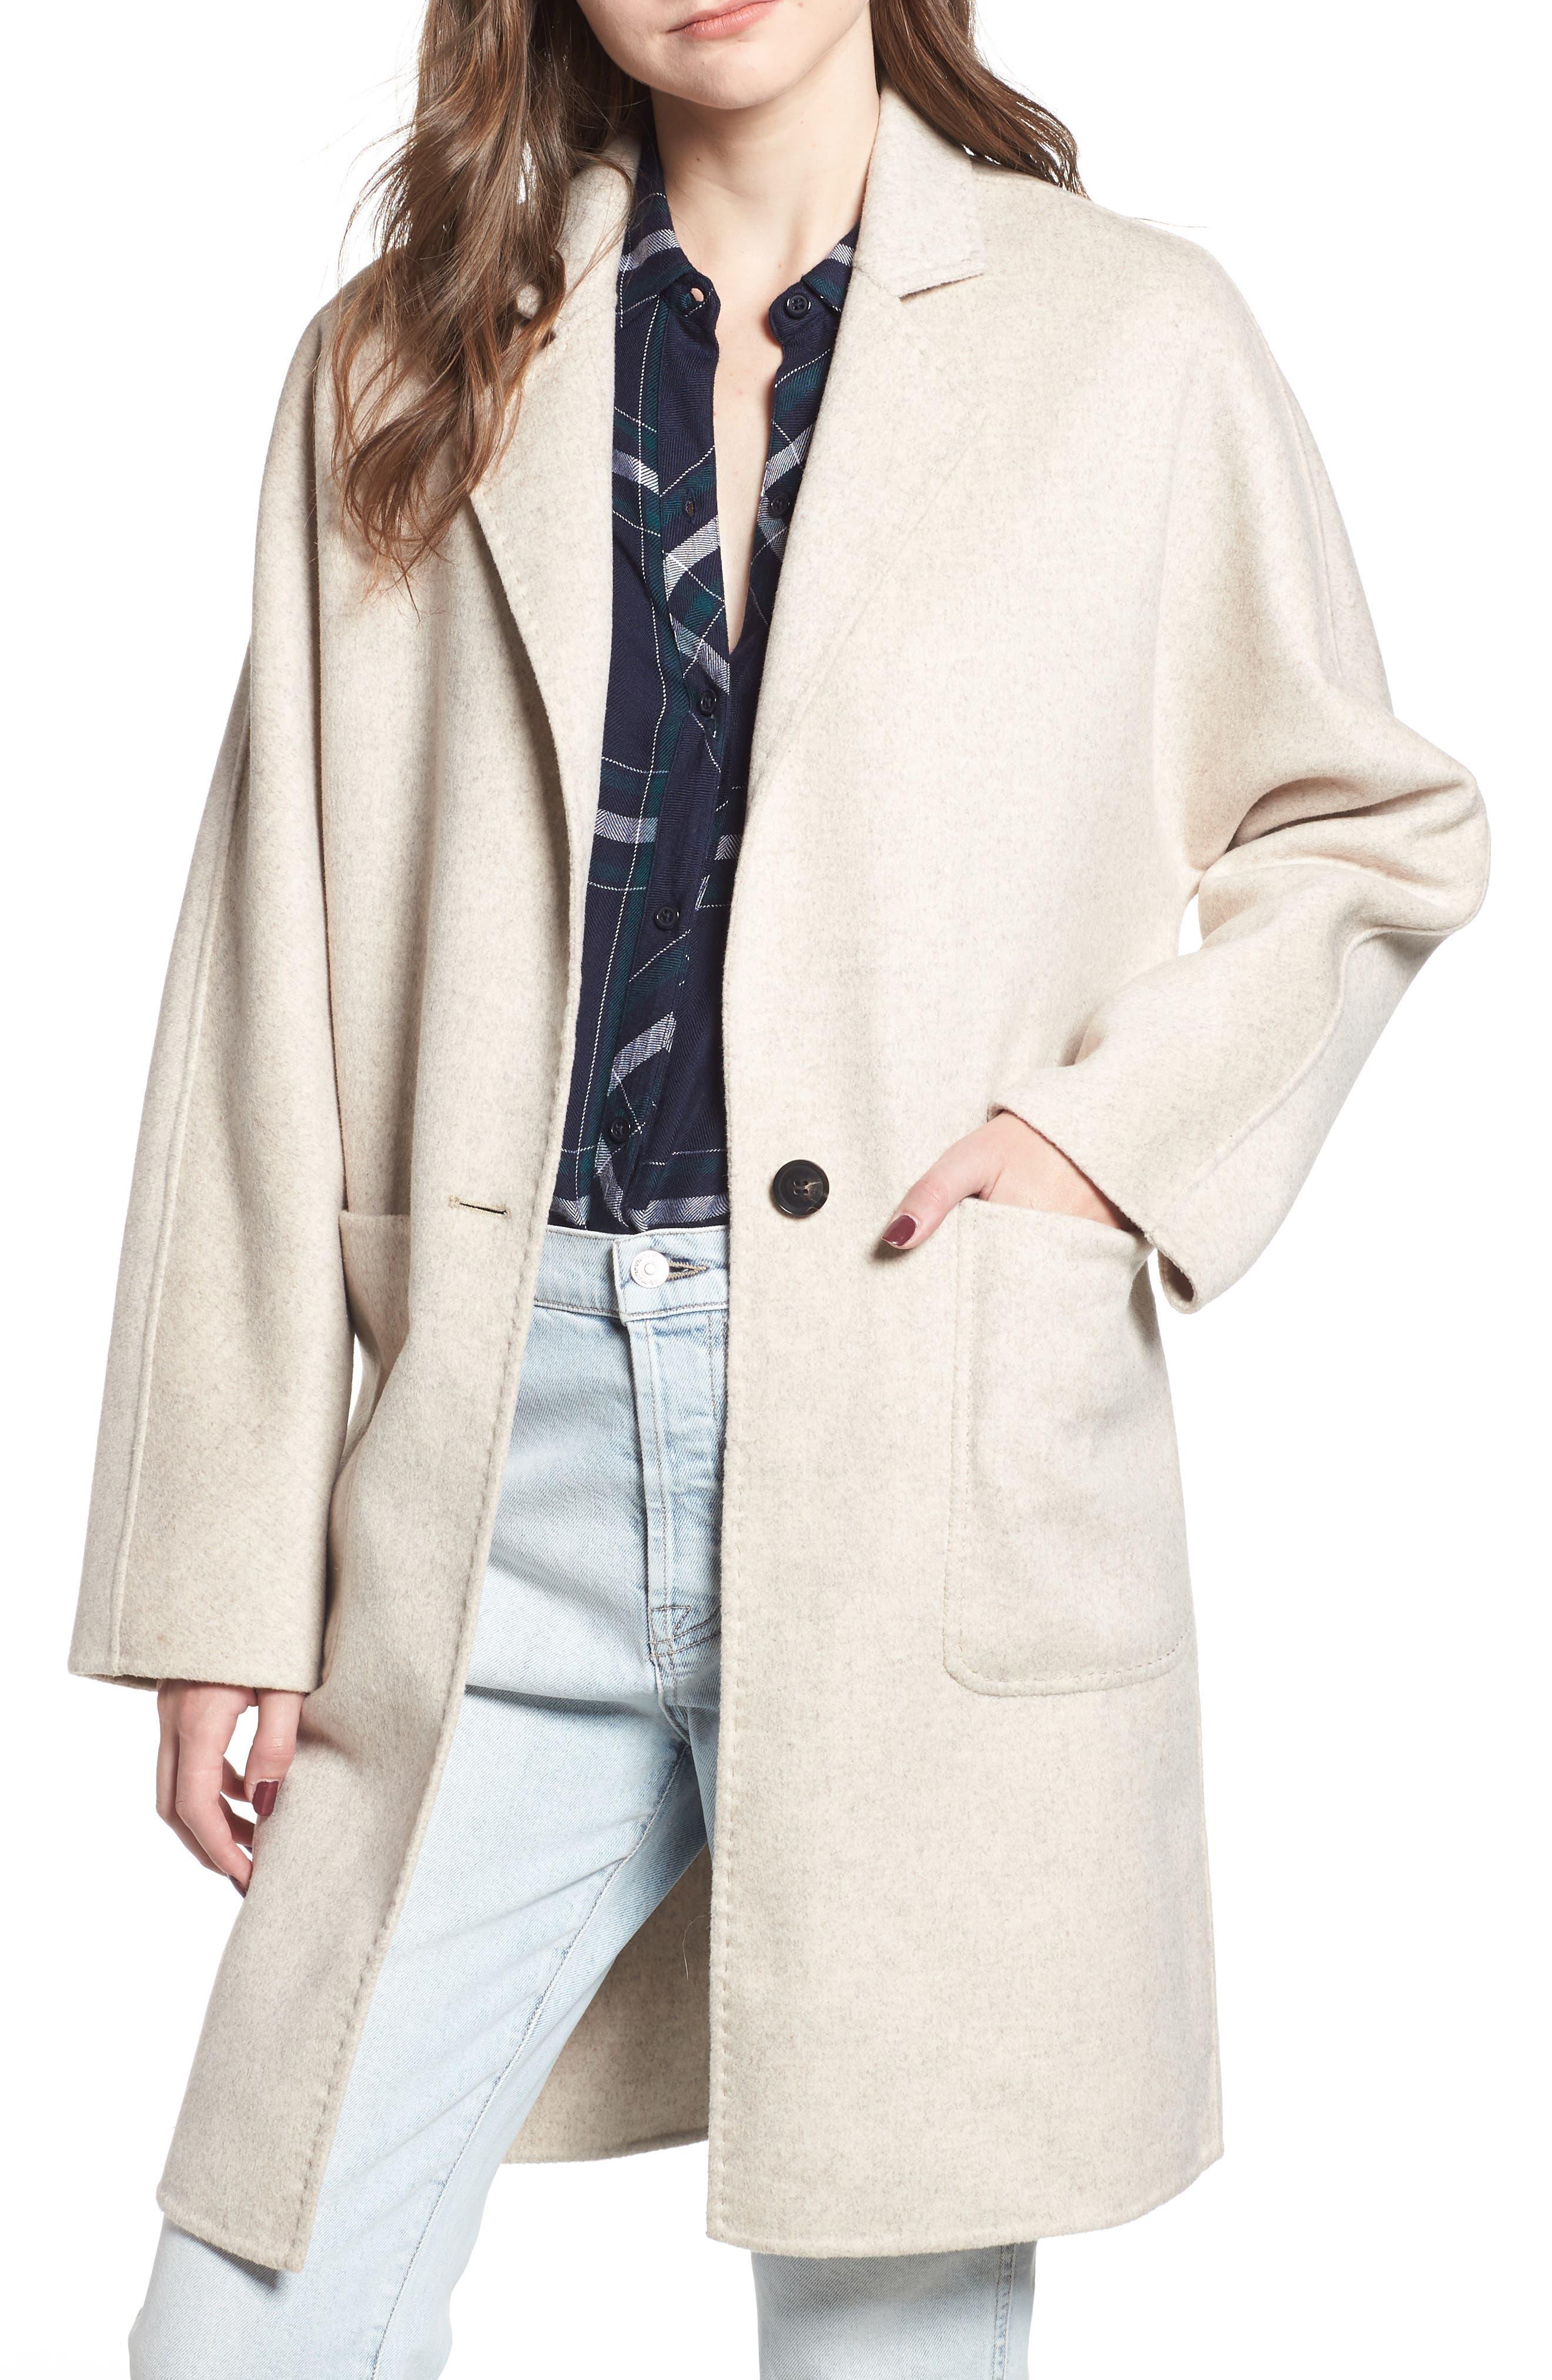 Everest Wool Blend Coat,                             Main thumbnail 1, color,                             905